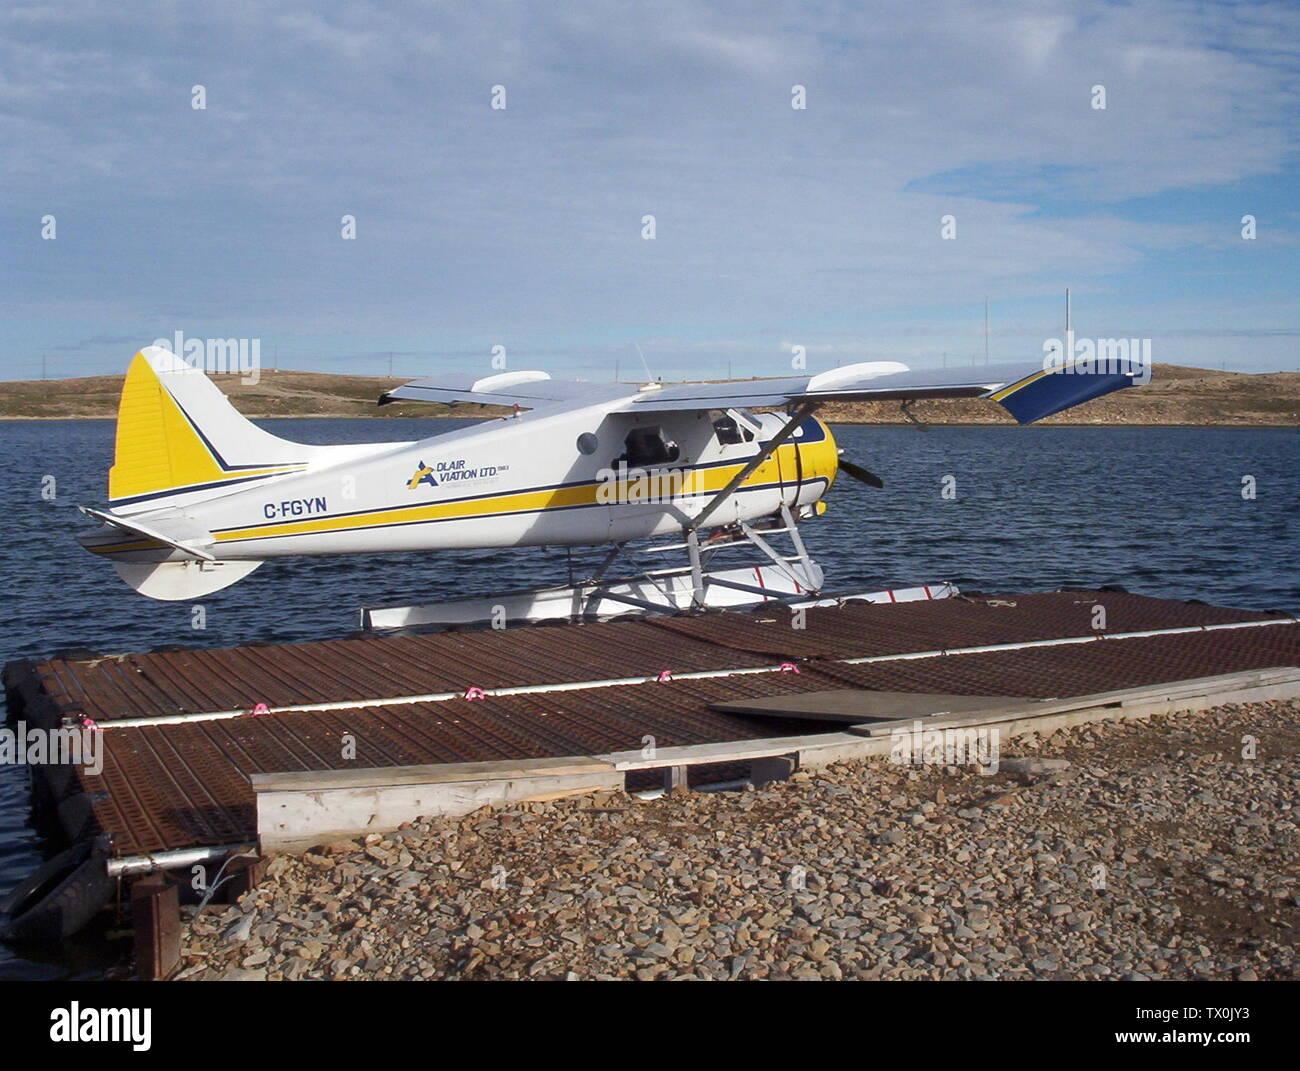 'English: C-FGYN Adlair Aviation Ltd. de Havilland Beaver (DHC2) Mk.I, at the Adlair Float Base, Cambridge Bay, Nunavut, Canada.; 31 July 2005, 17:10; Own work; CambridgeBayWeather; ' - Stock Image